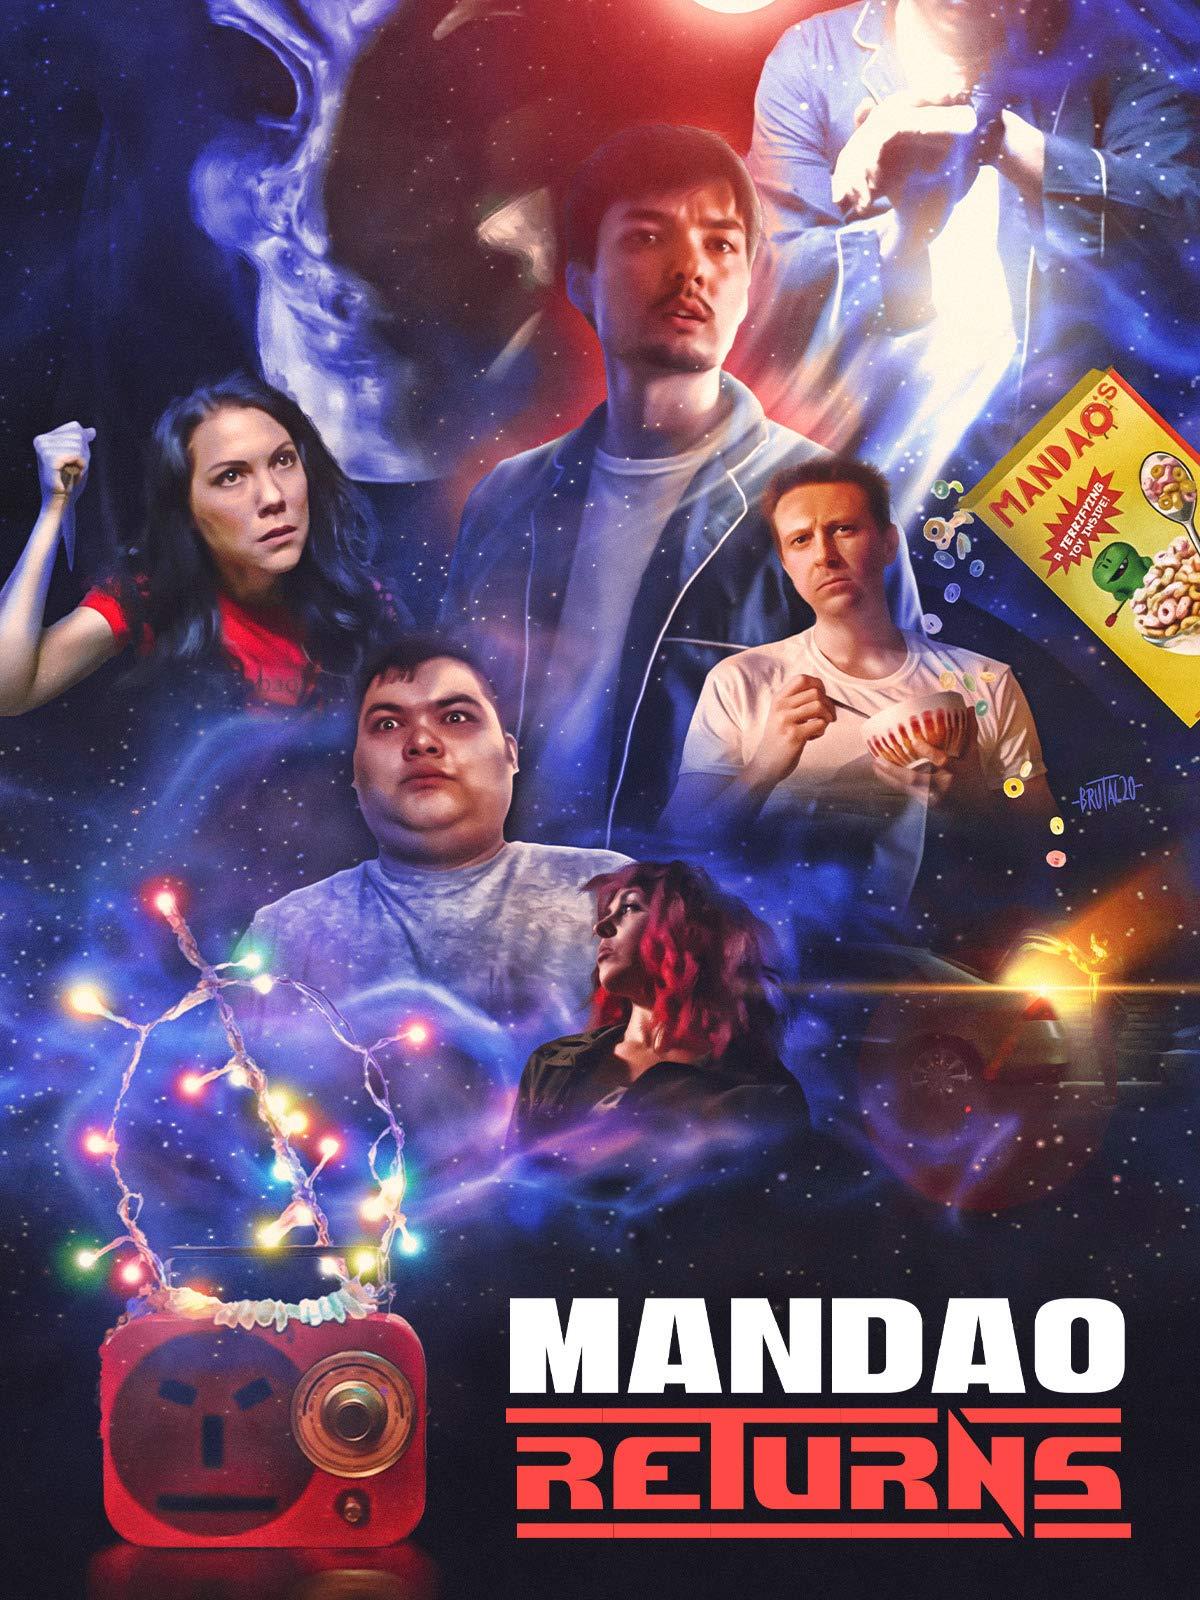 Amazon.com: Mandao Returns: Jenny Lorenzo, Sean Liang, Scott Dunn, Scott  Dunn